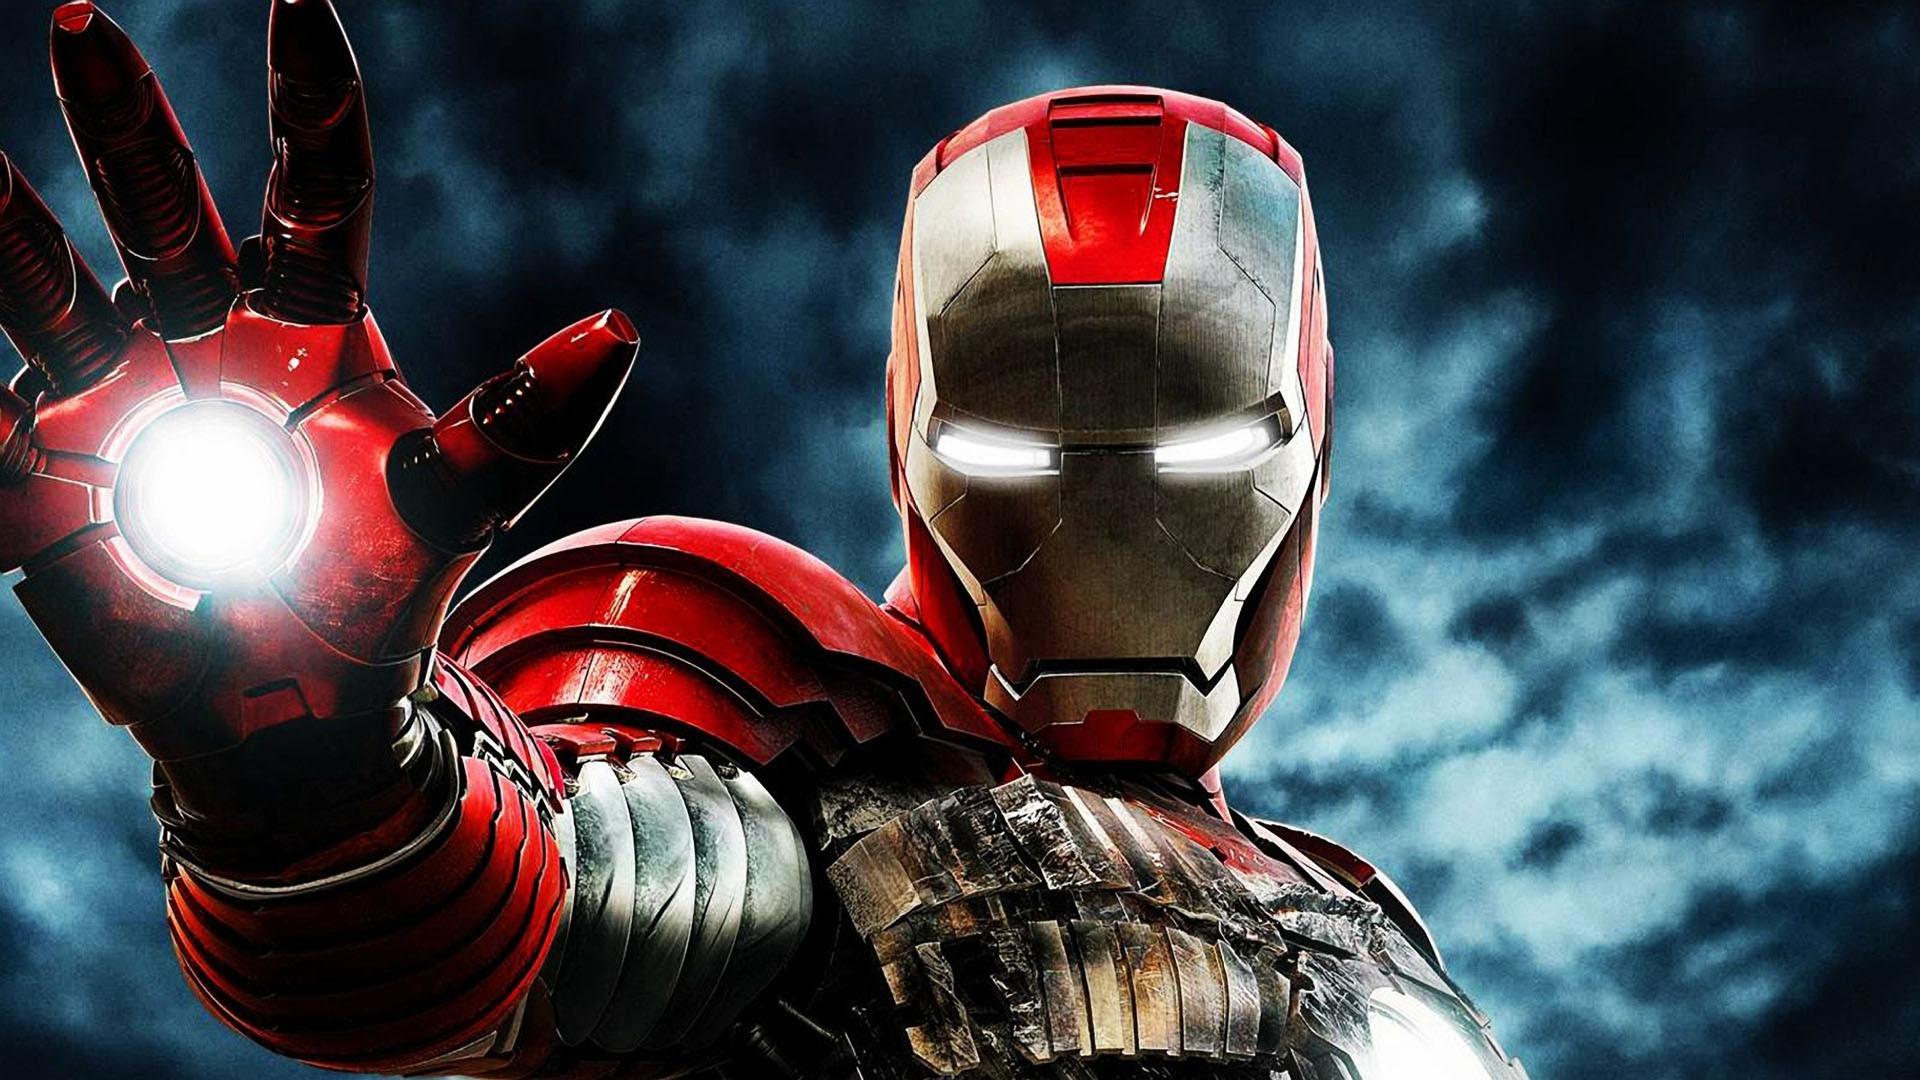 Free HD Ironman Wallpaper